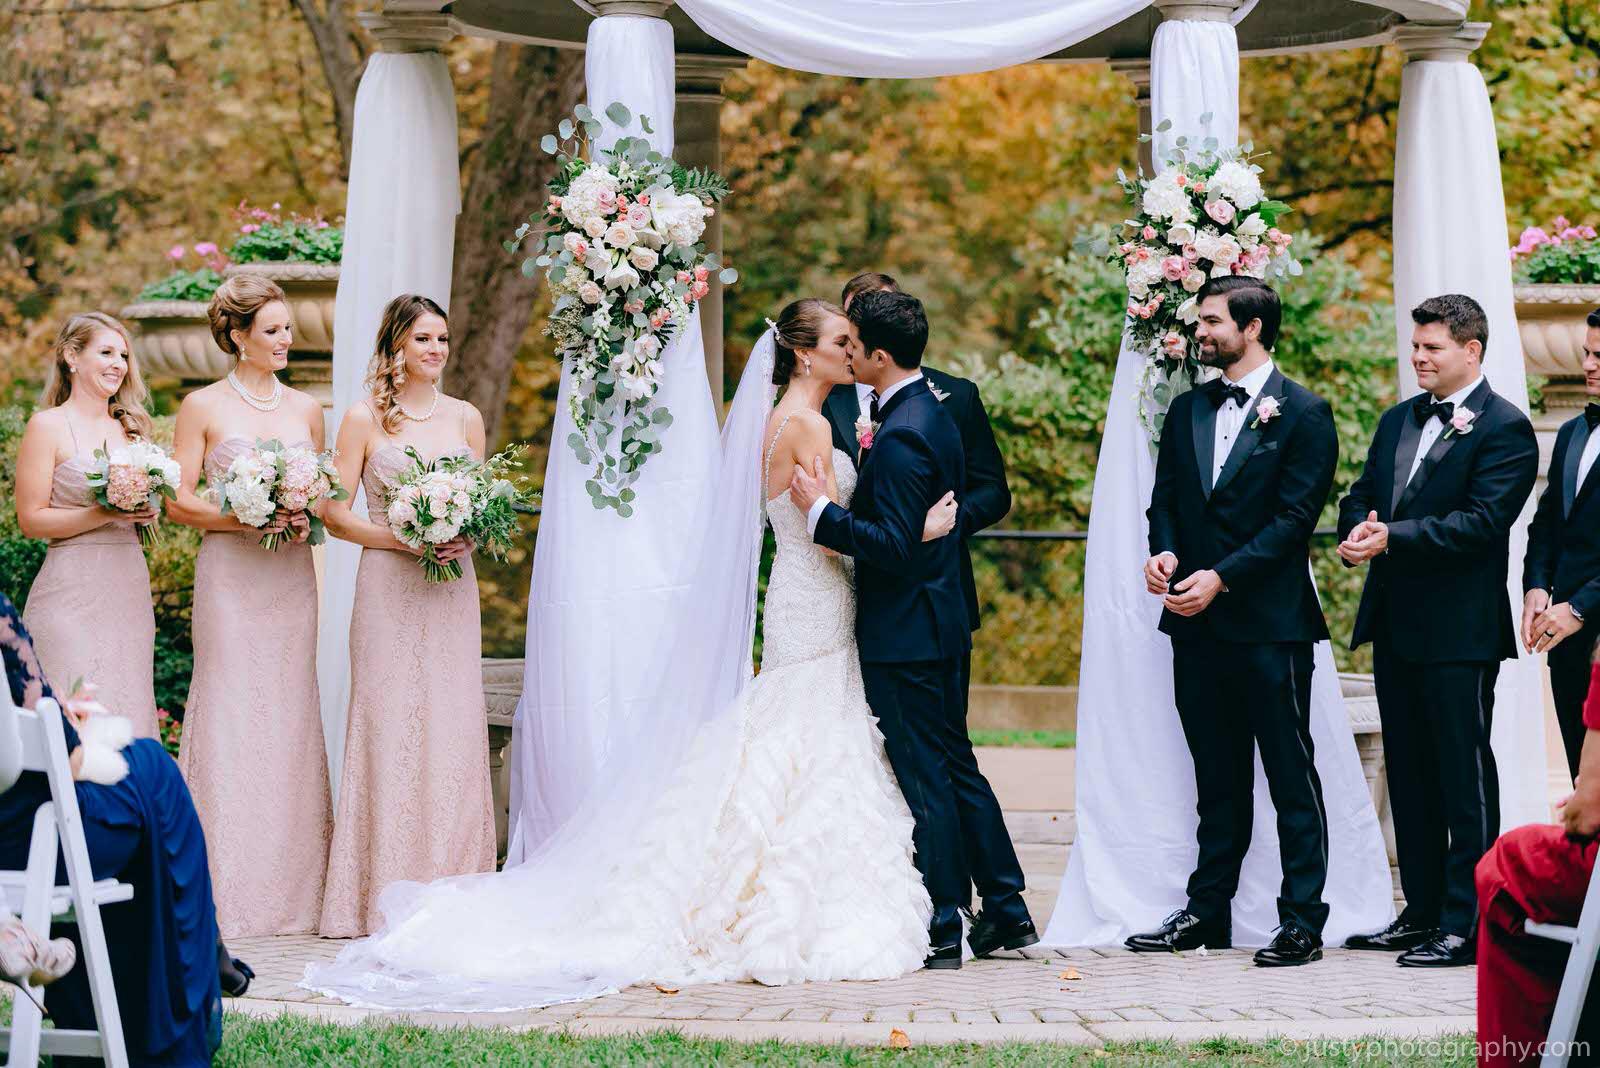 Omni Shoreham wedding photos-washington-dc-wedding-venues (120 of 171).jpg